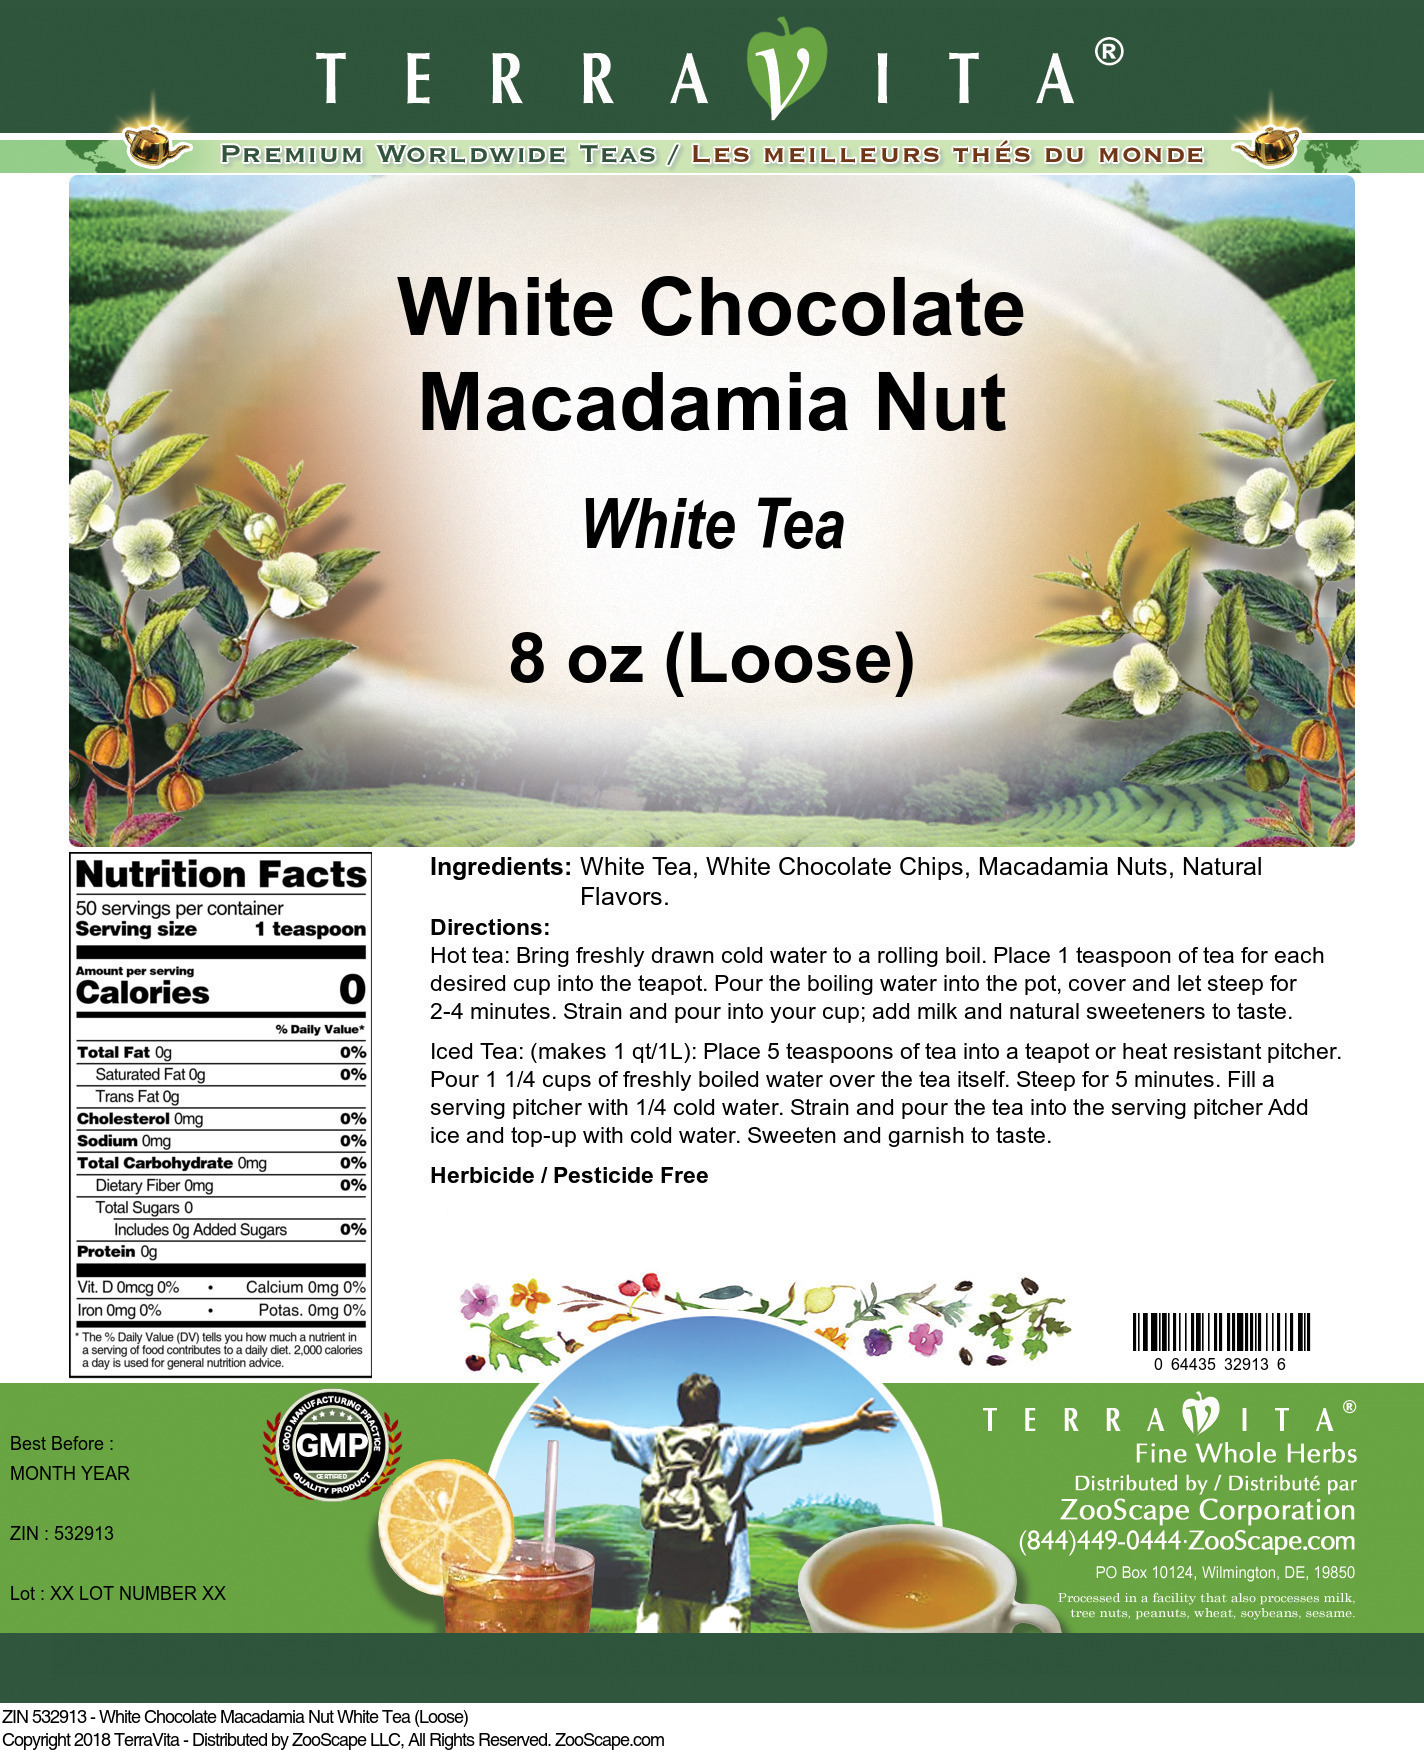 White Chocolate Macadamia Nut White Tea